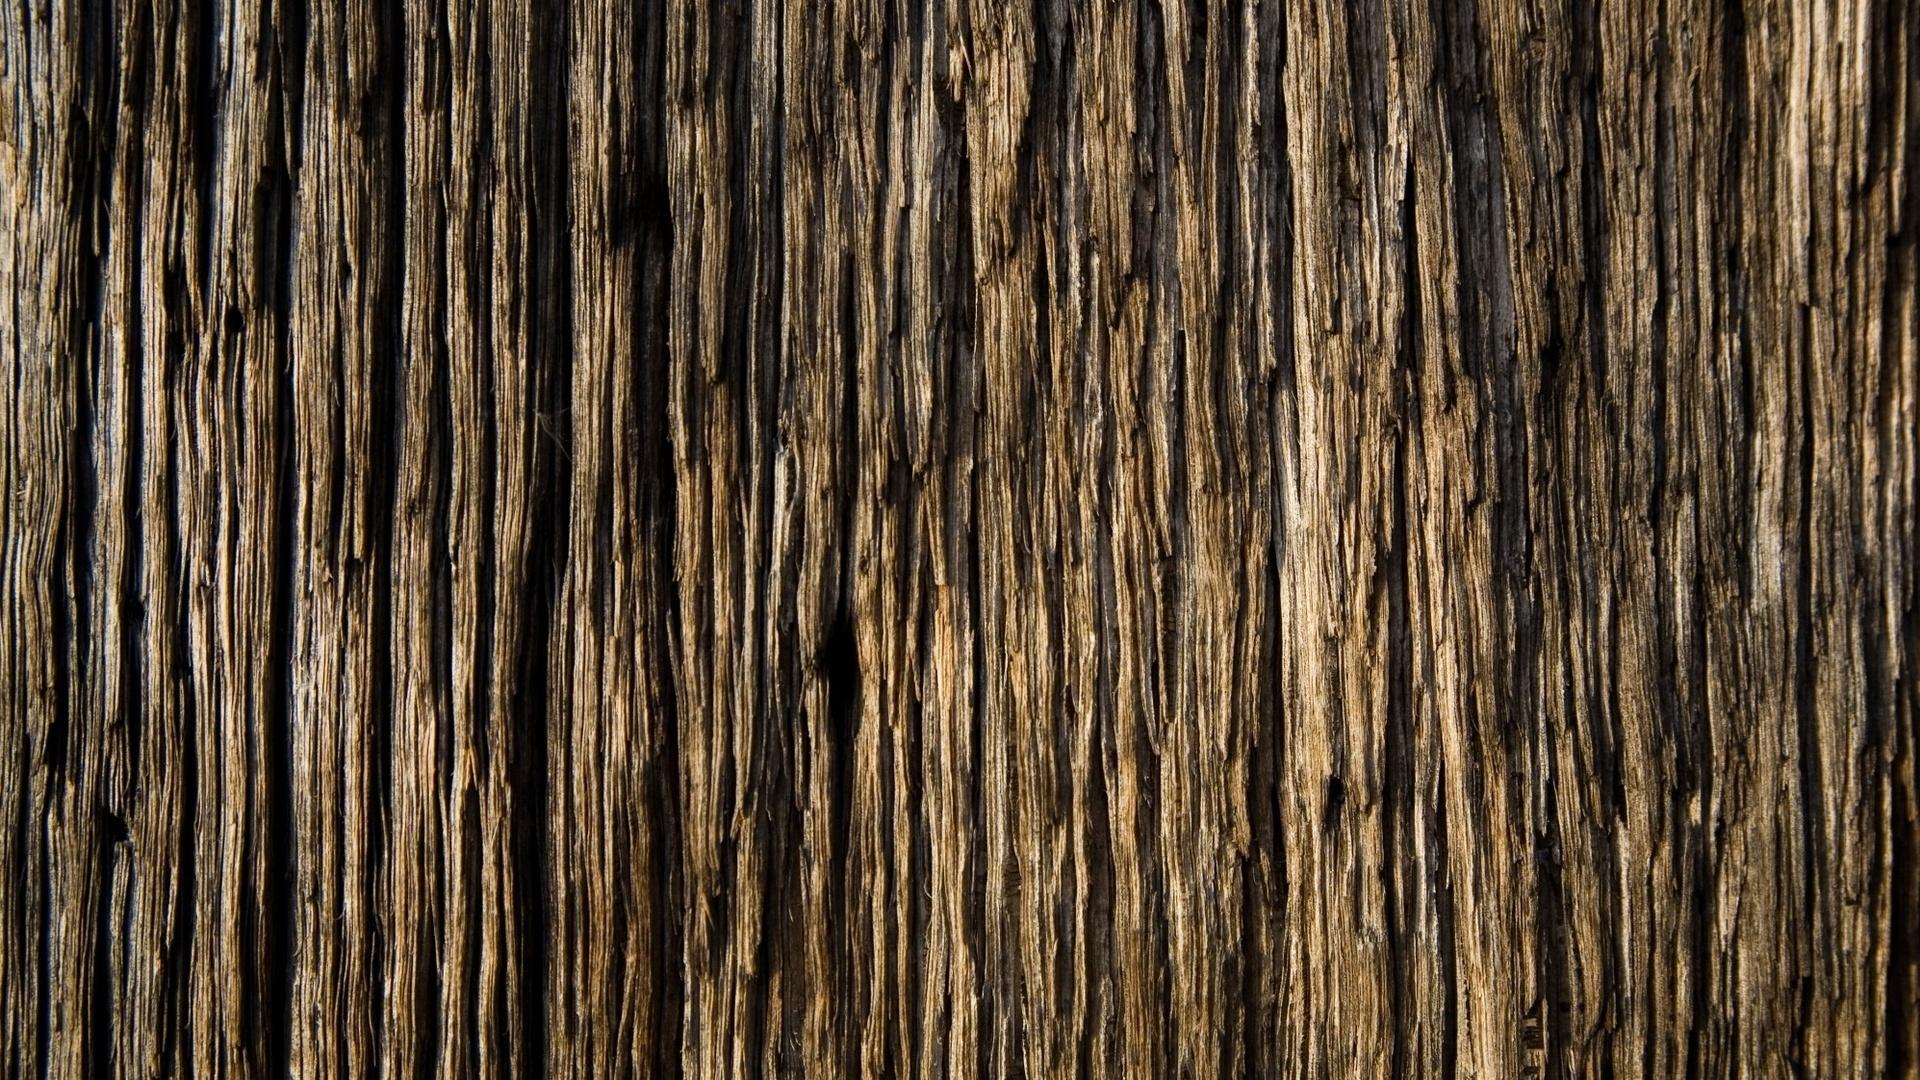 Download Wallpaper 1920x1080 bark, wood, background, texture Full HD ...